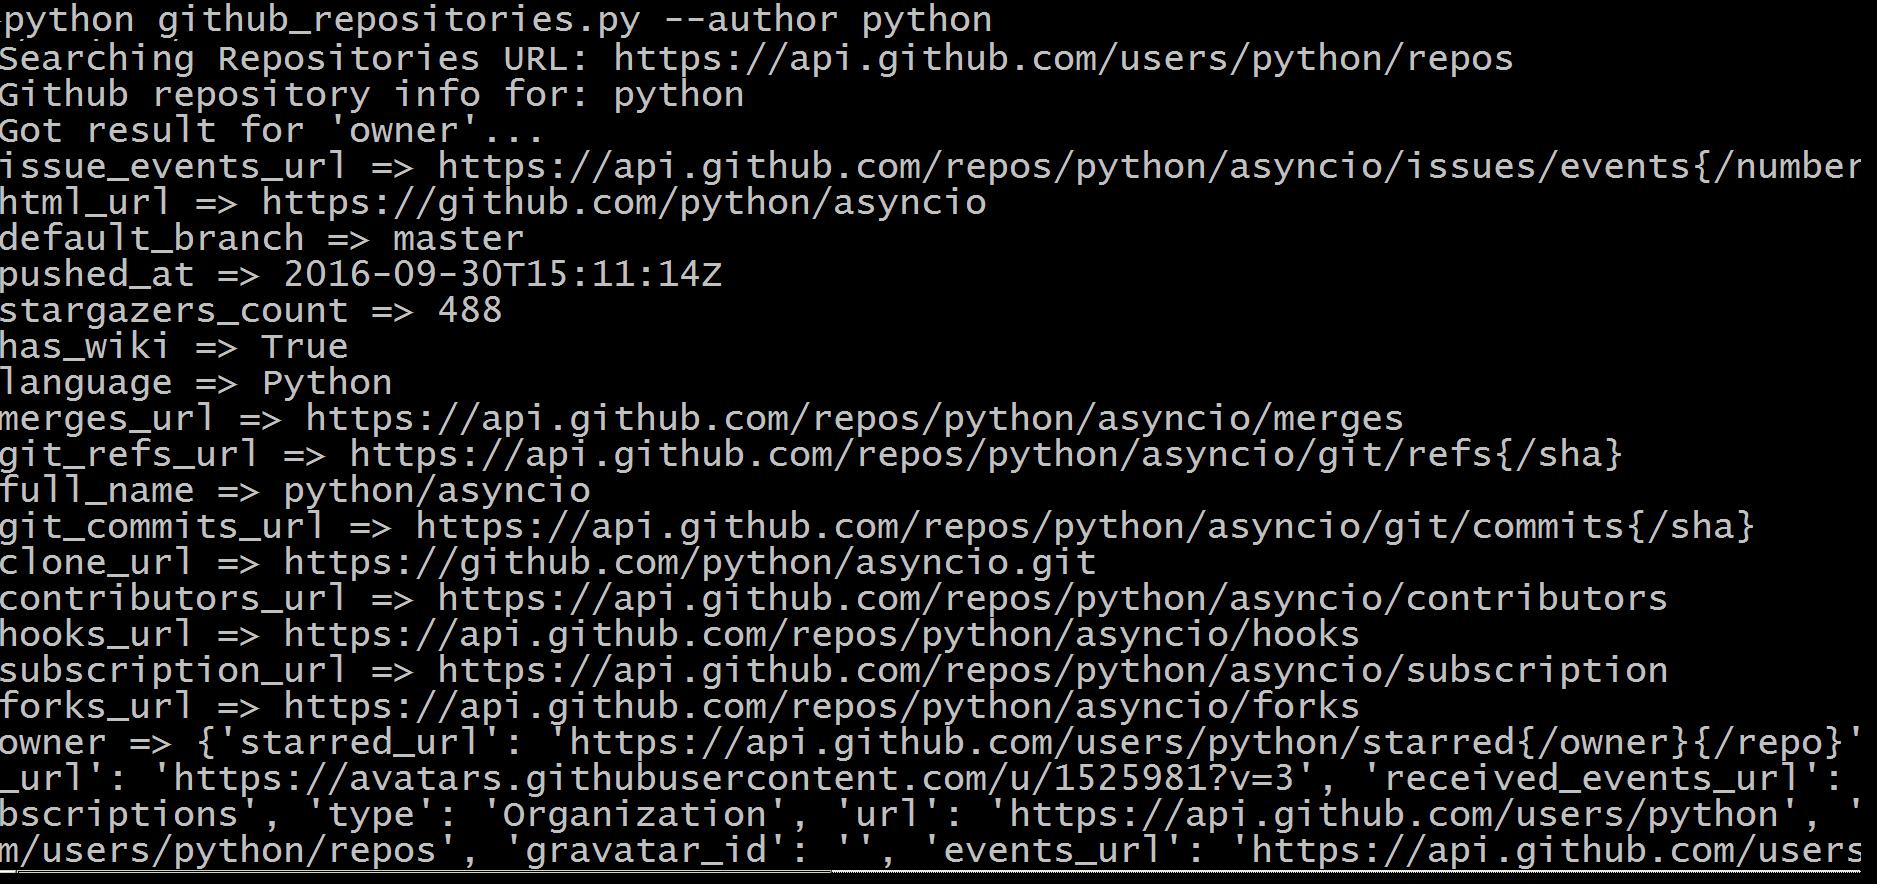 github_repositories